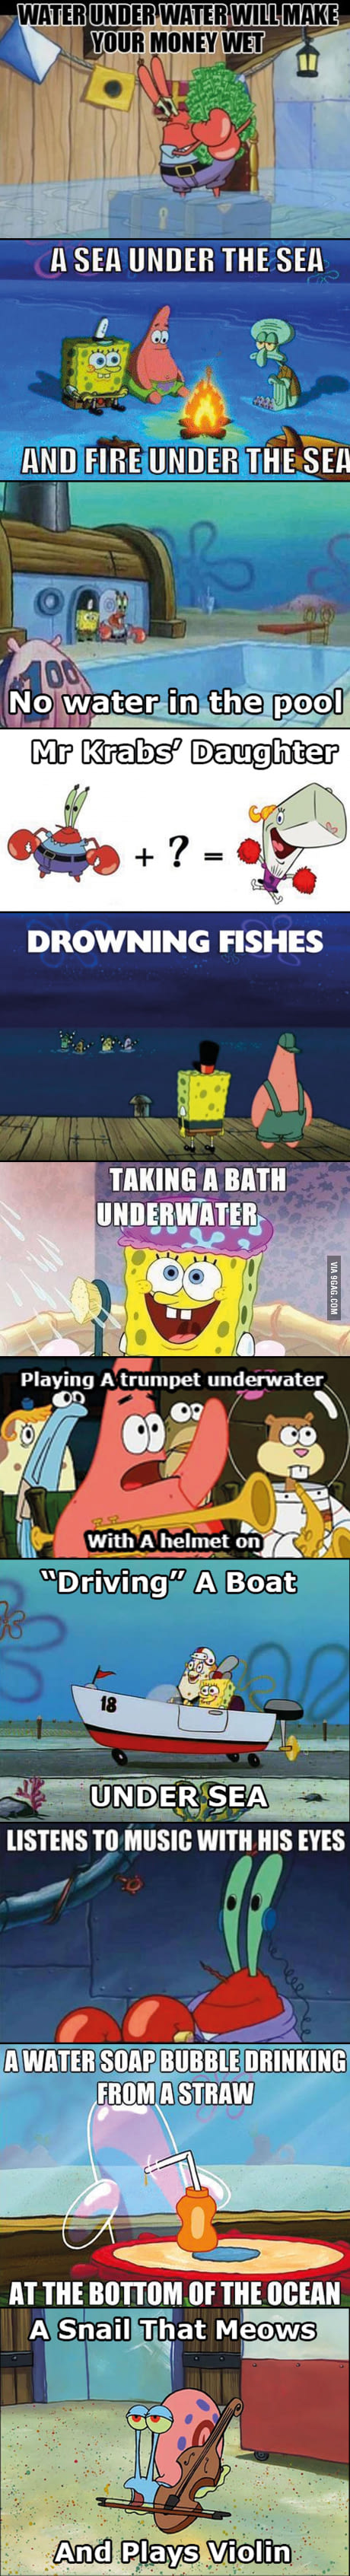 Spongebob Logic Spongebob logic, Spongebob funny, Funny